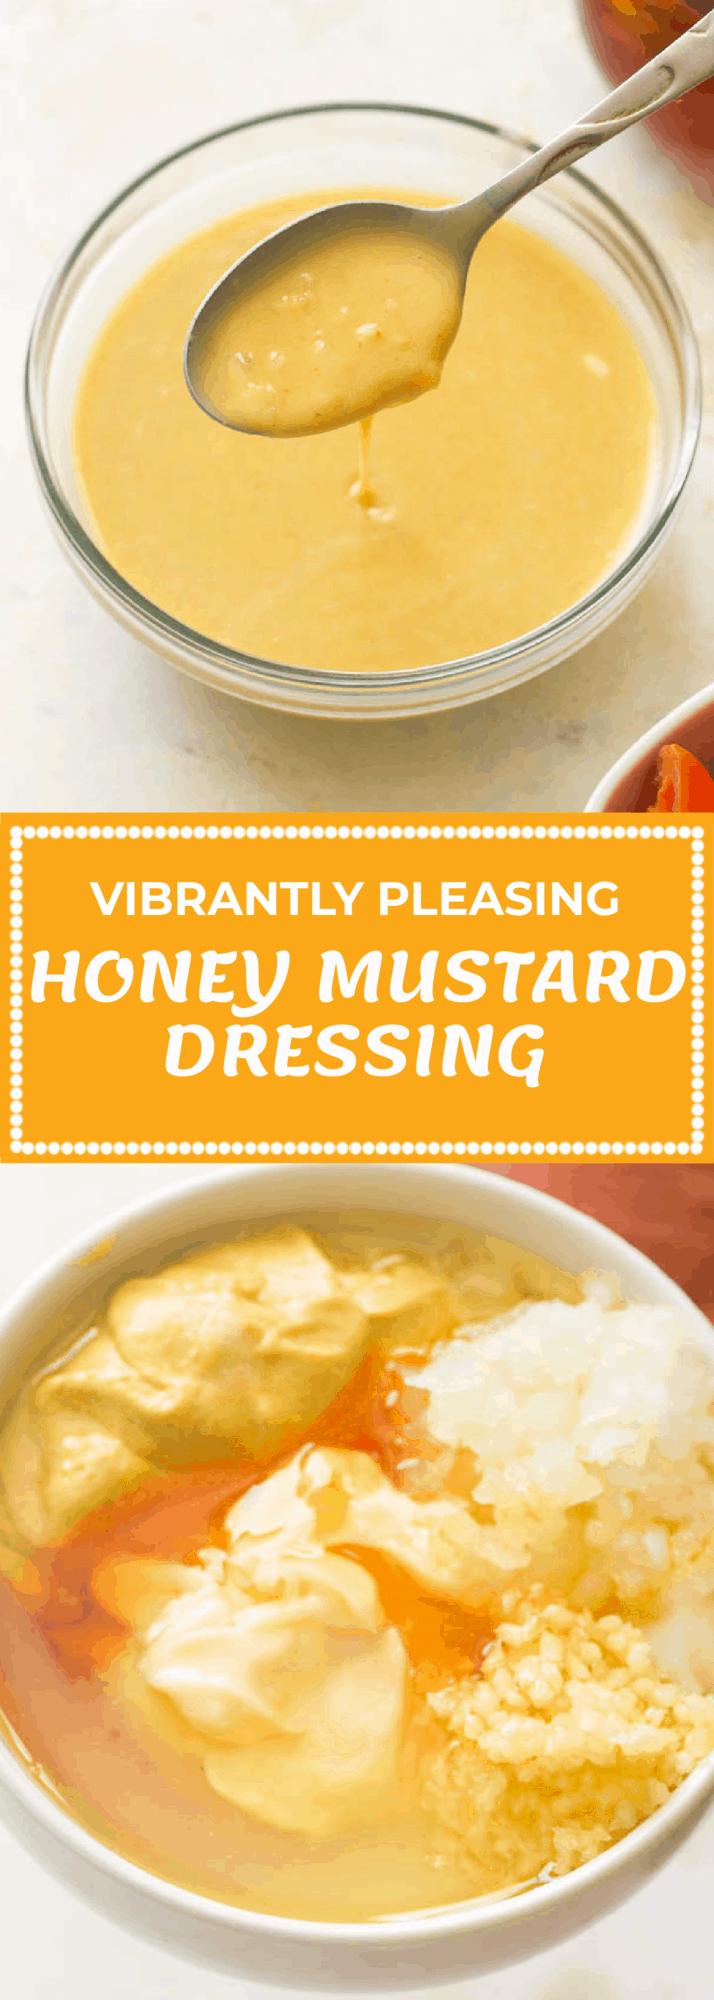 How To Honey Mustard Dressing